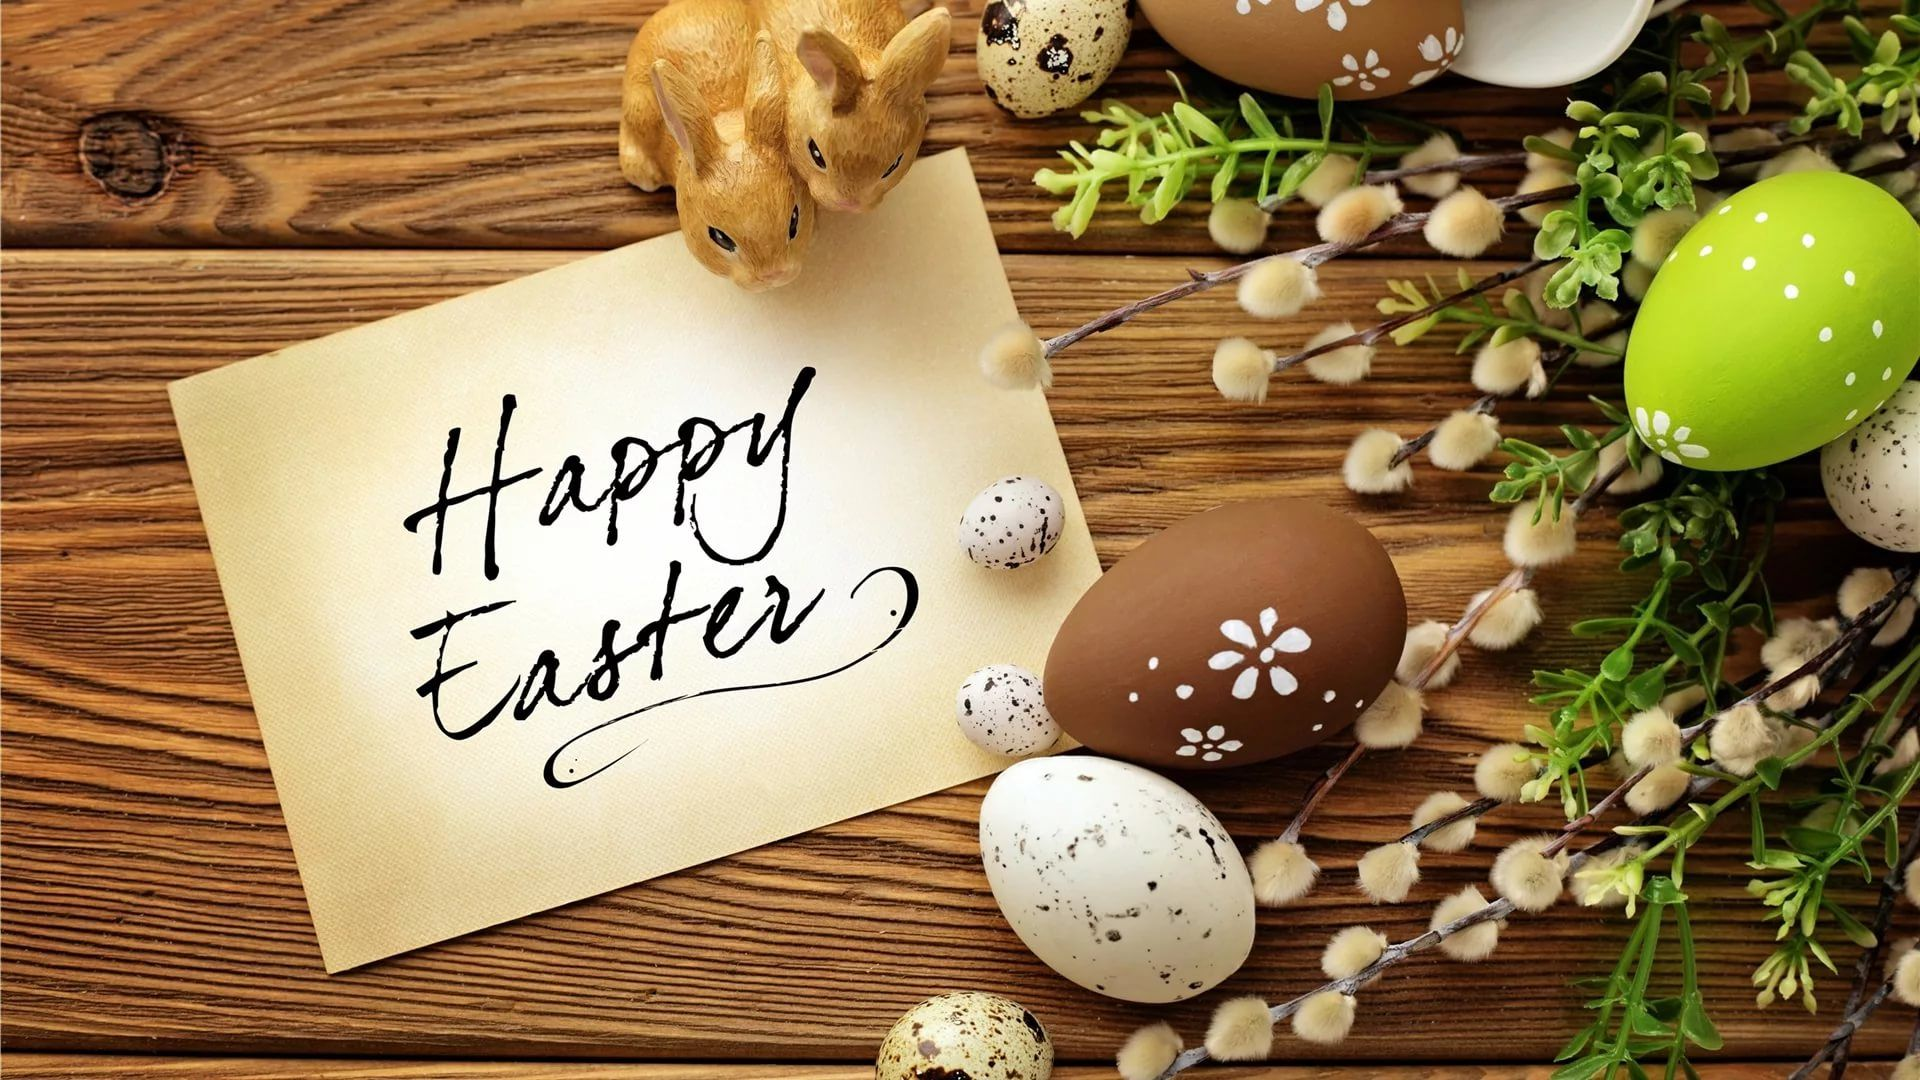 Happy Easter laptop wallpaper